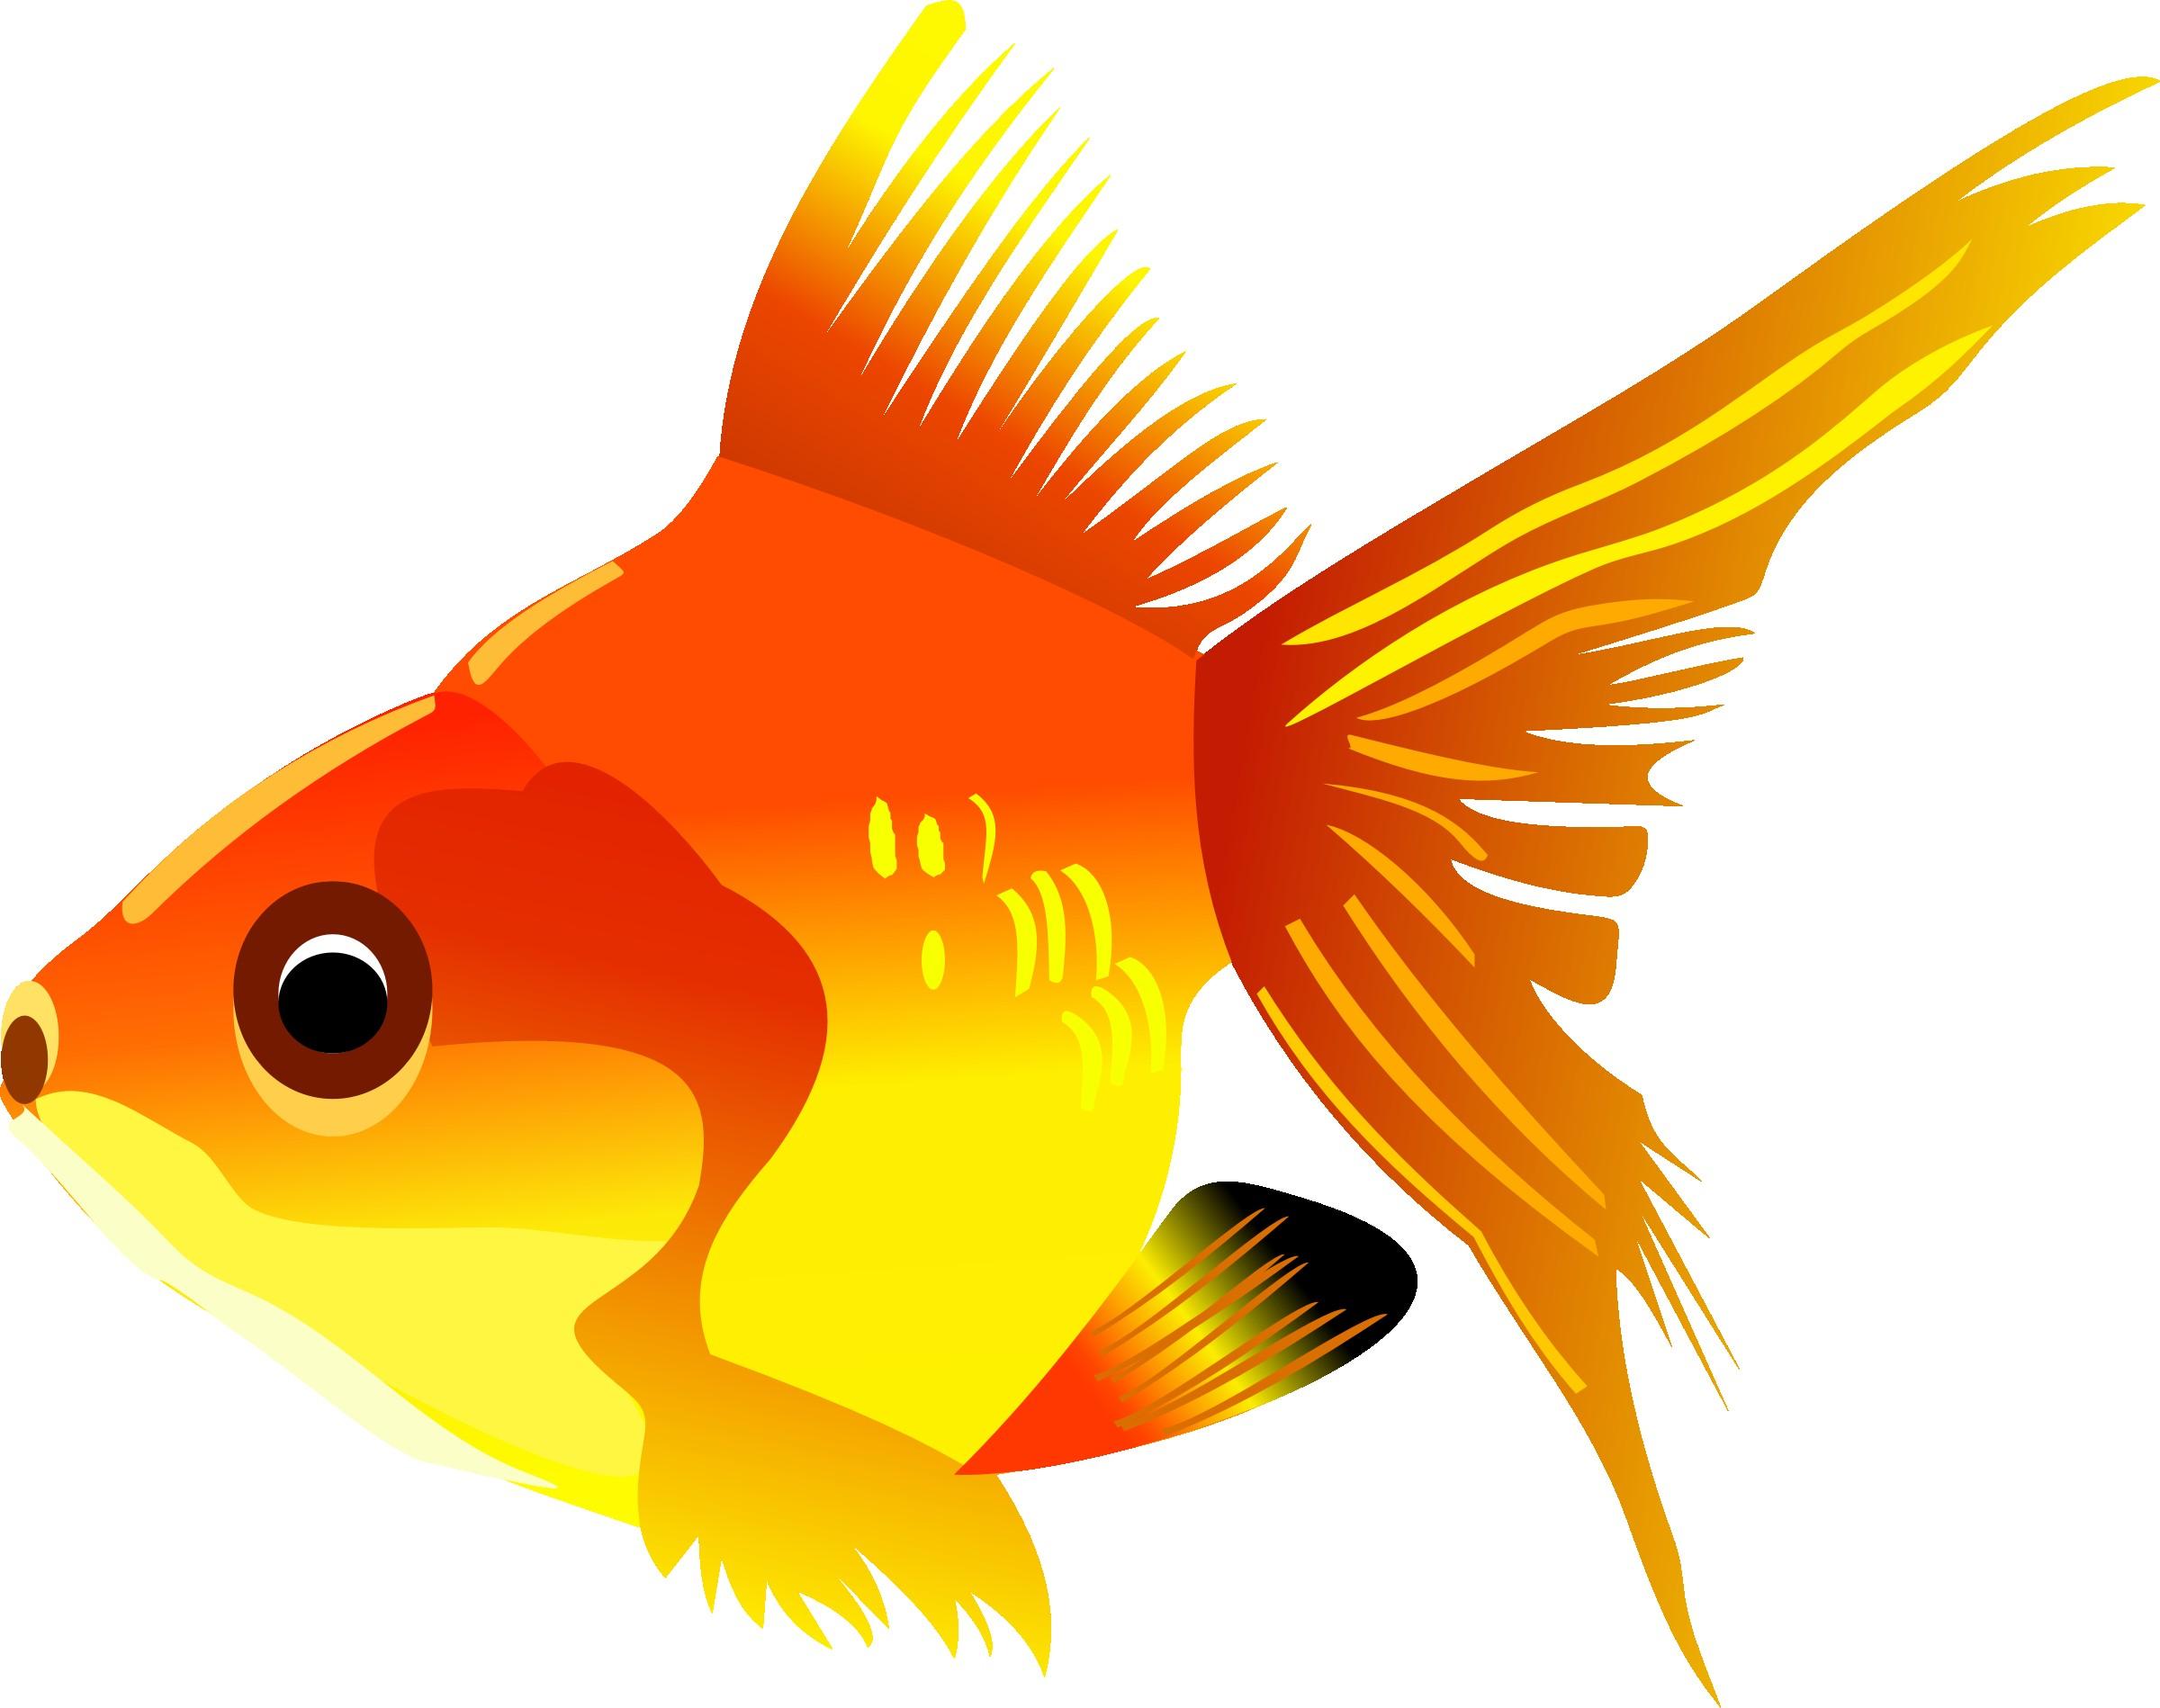 2400x1898 Goldfish Transparent Png Clip Art Image Gallery Yopriceville